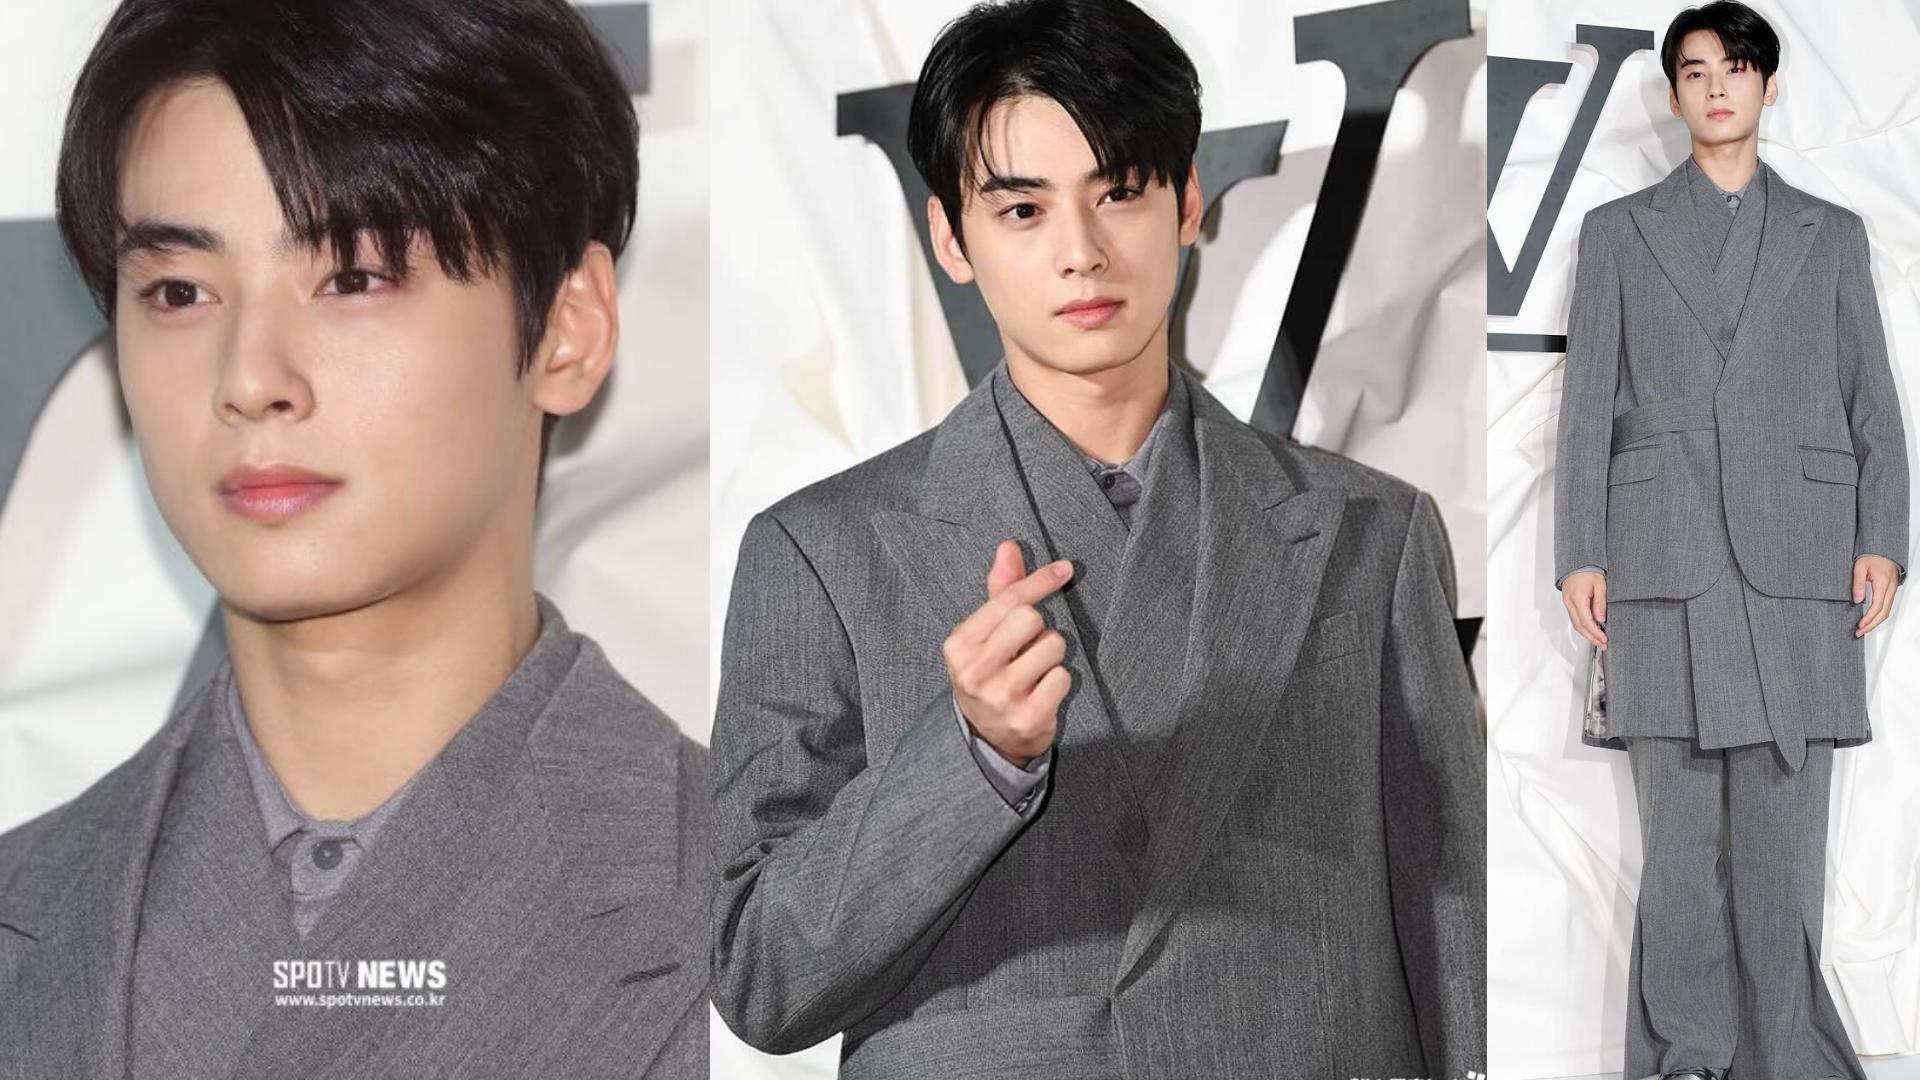 Cha Eun Woo at Louis Vuitton Event (credits: SPOTV News)